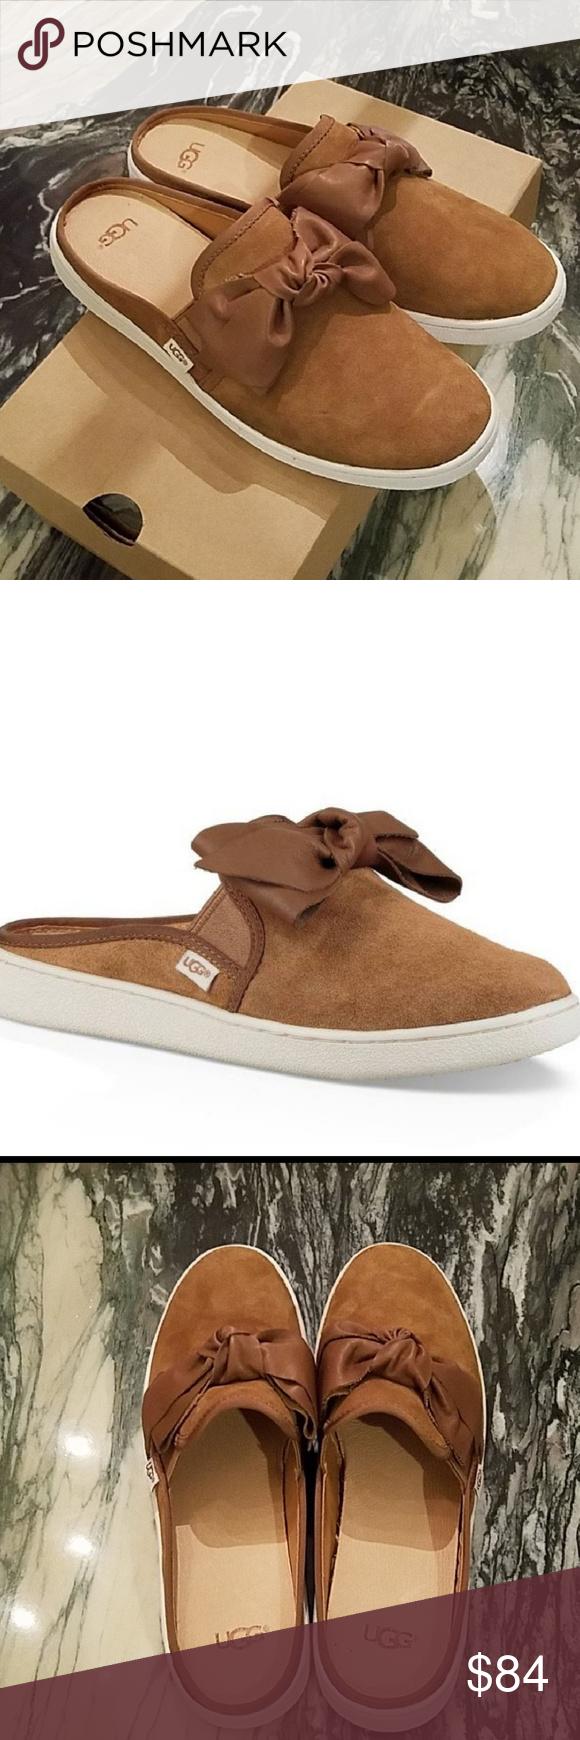 UGG Ida Mule Sneaker in Chestnut Cognac